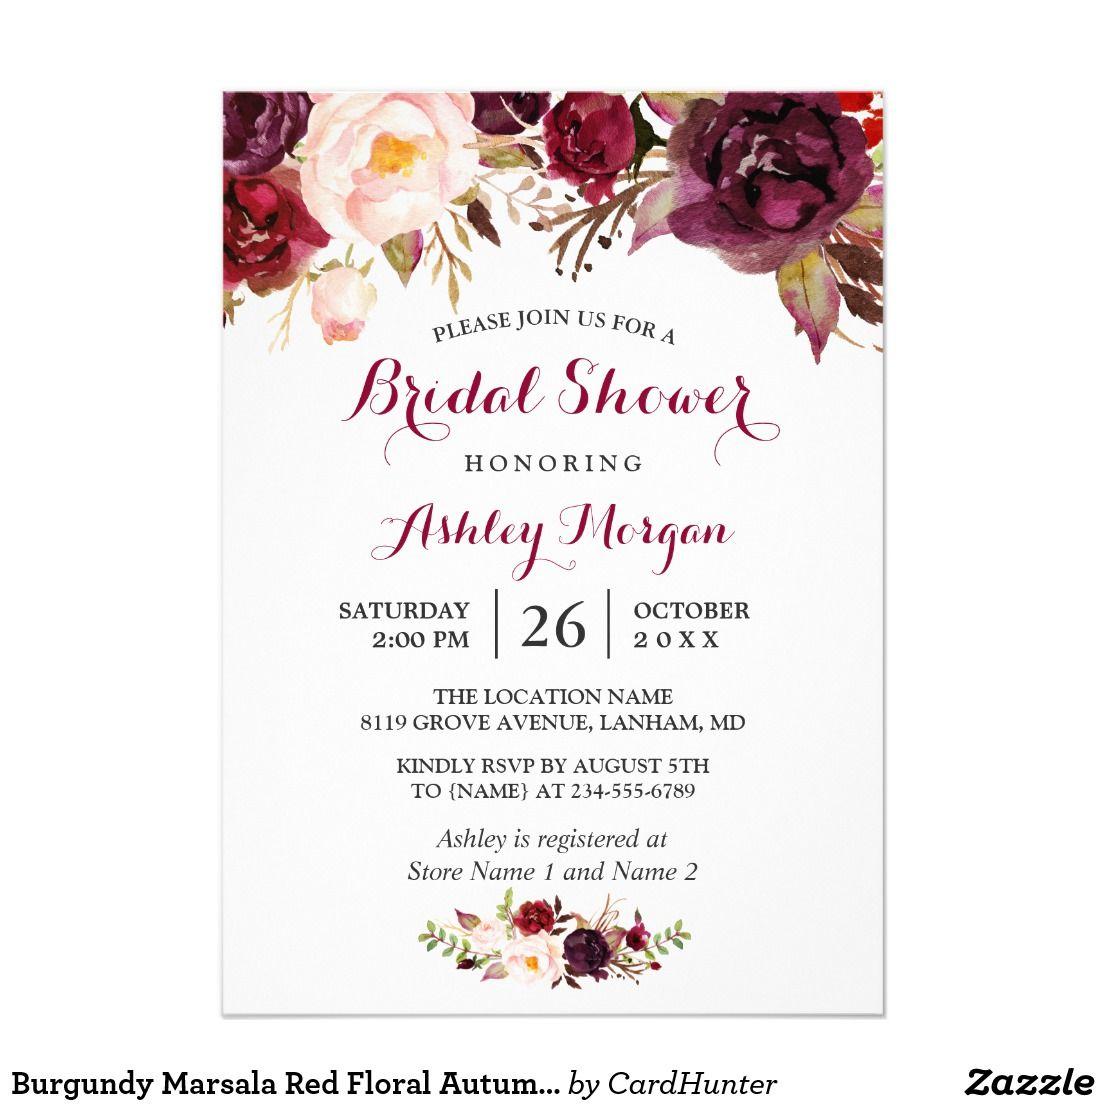 Burgundy Marsala Red Floral Autumn Bridal Shower Invitation ...